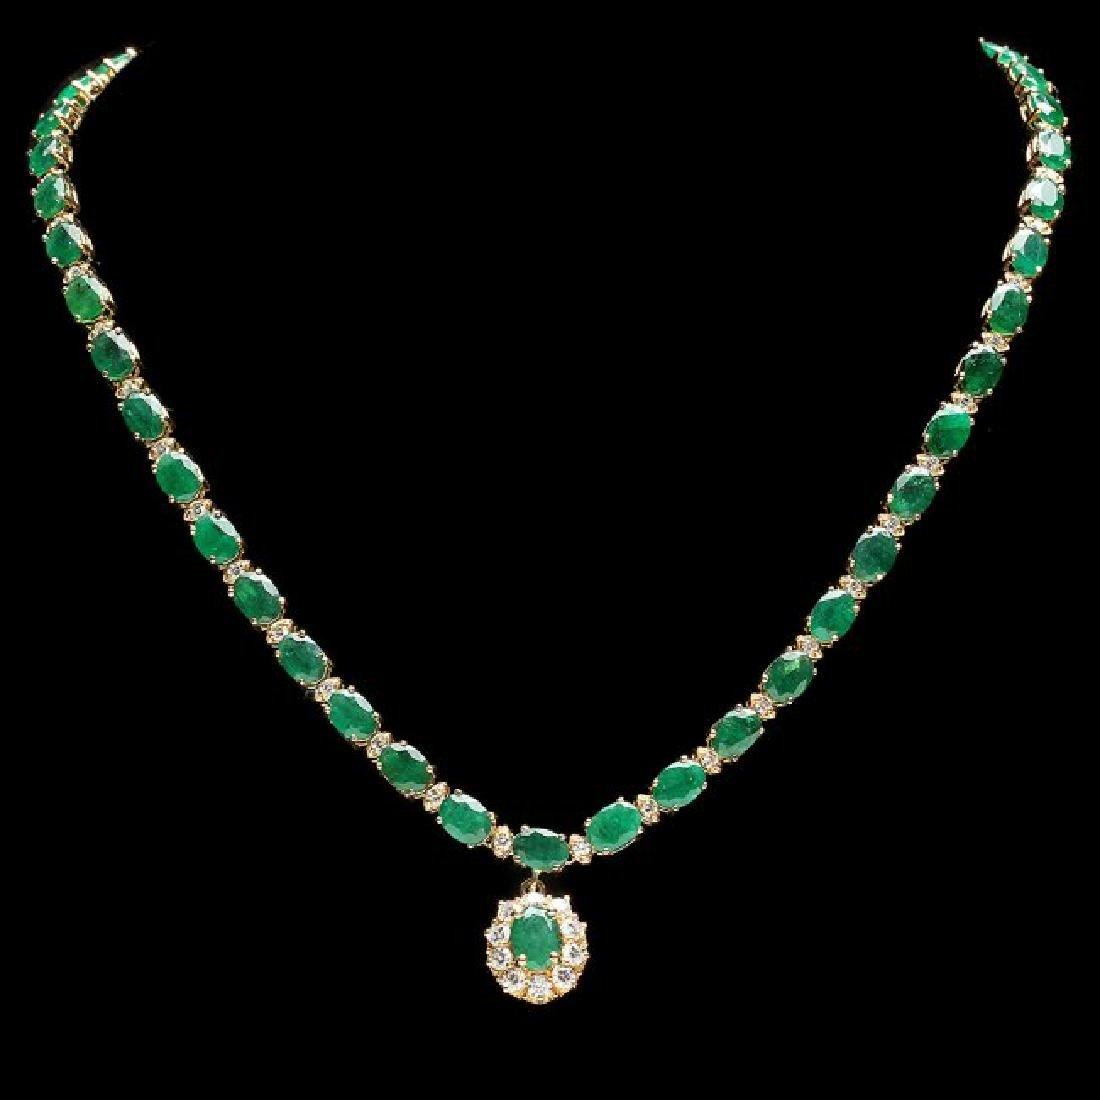 14k Gold 24.25ct Emerald 2.00ct Diamond Necklace - 2